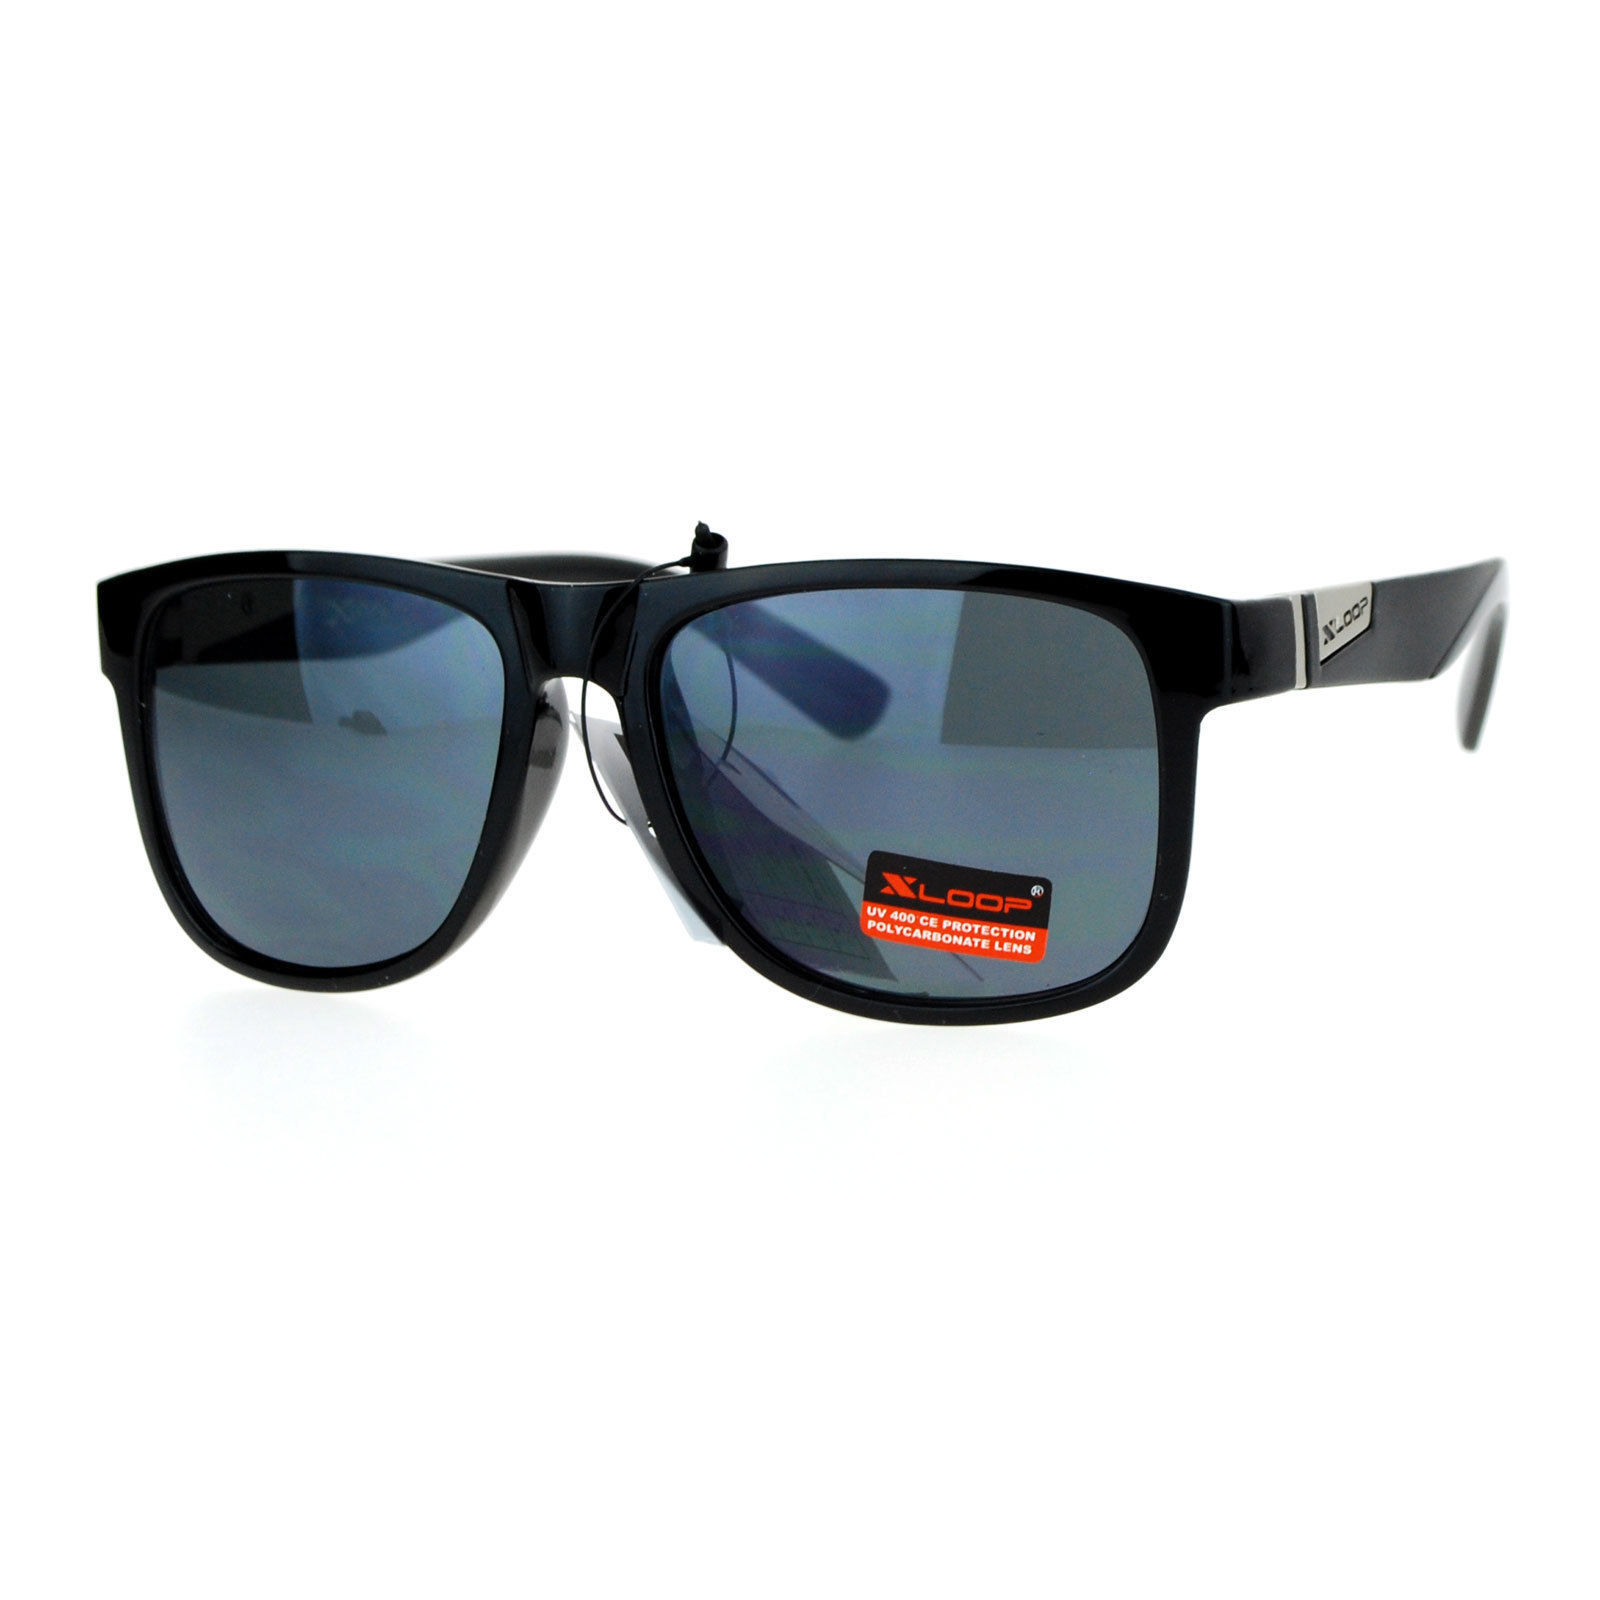 Xloop Sunglasses Square Frame Unisex Designer Fashion Sports Shades